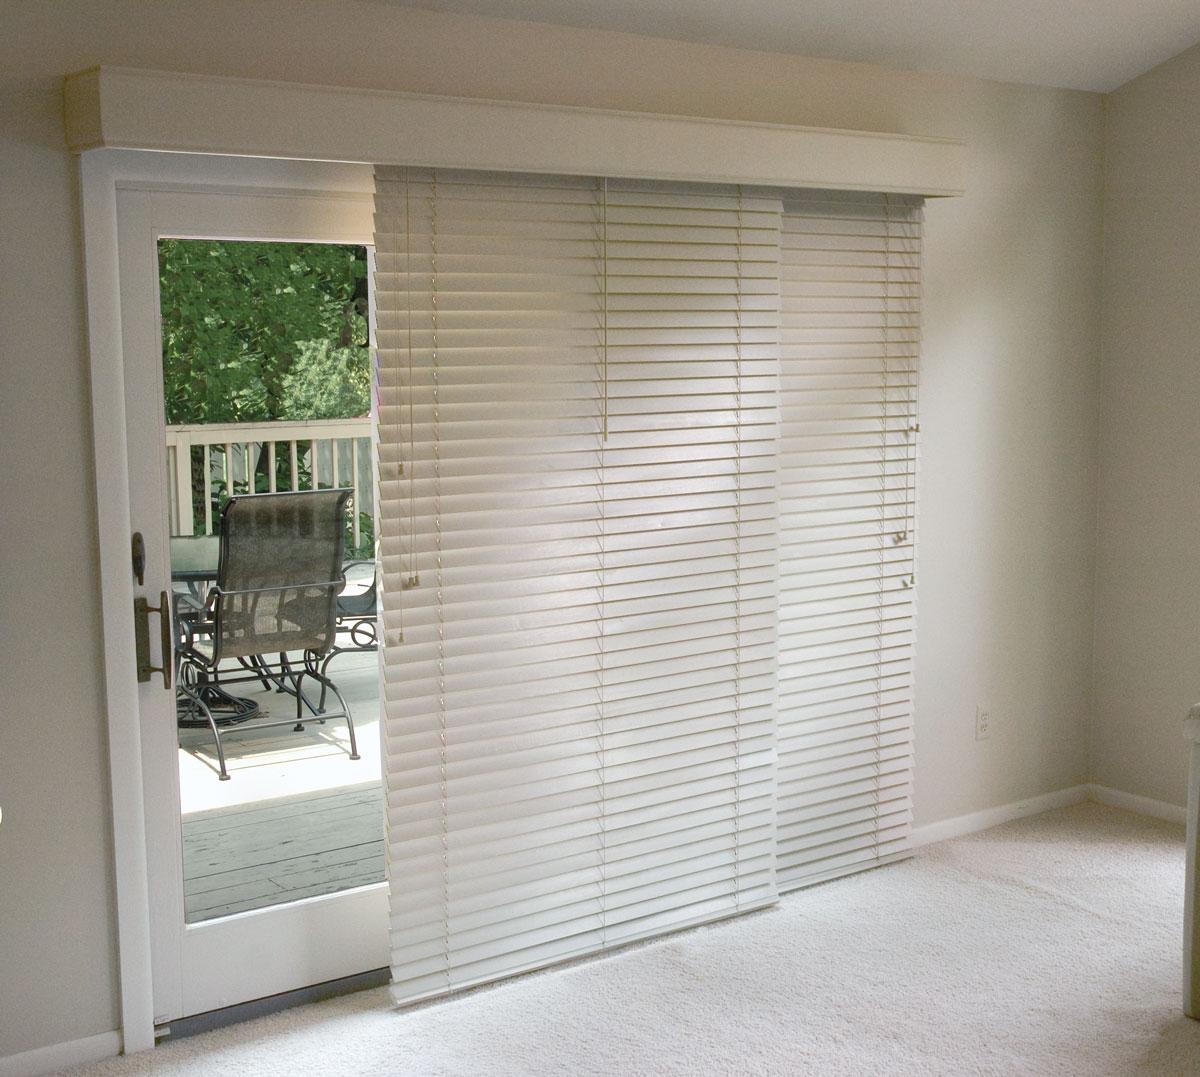 Horizontal Blinds For A Sliding Glass Door1200 X 1077